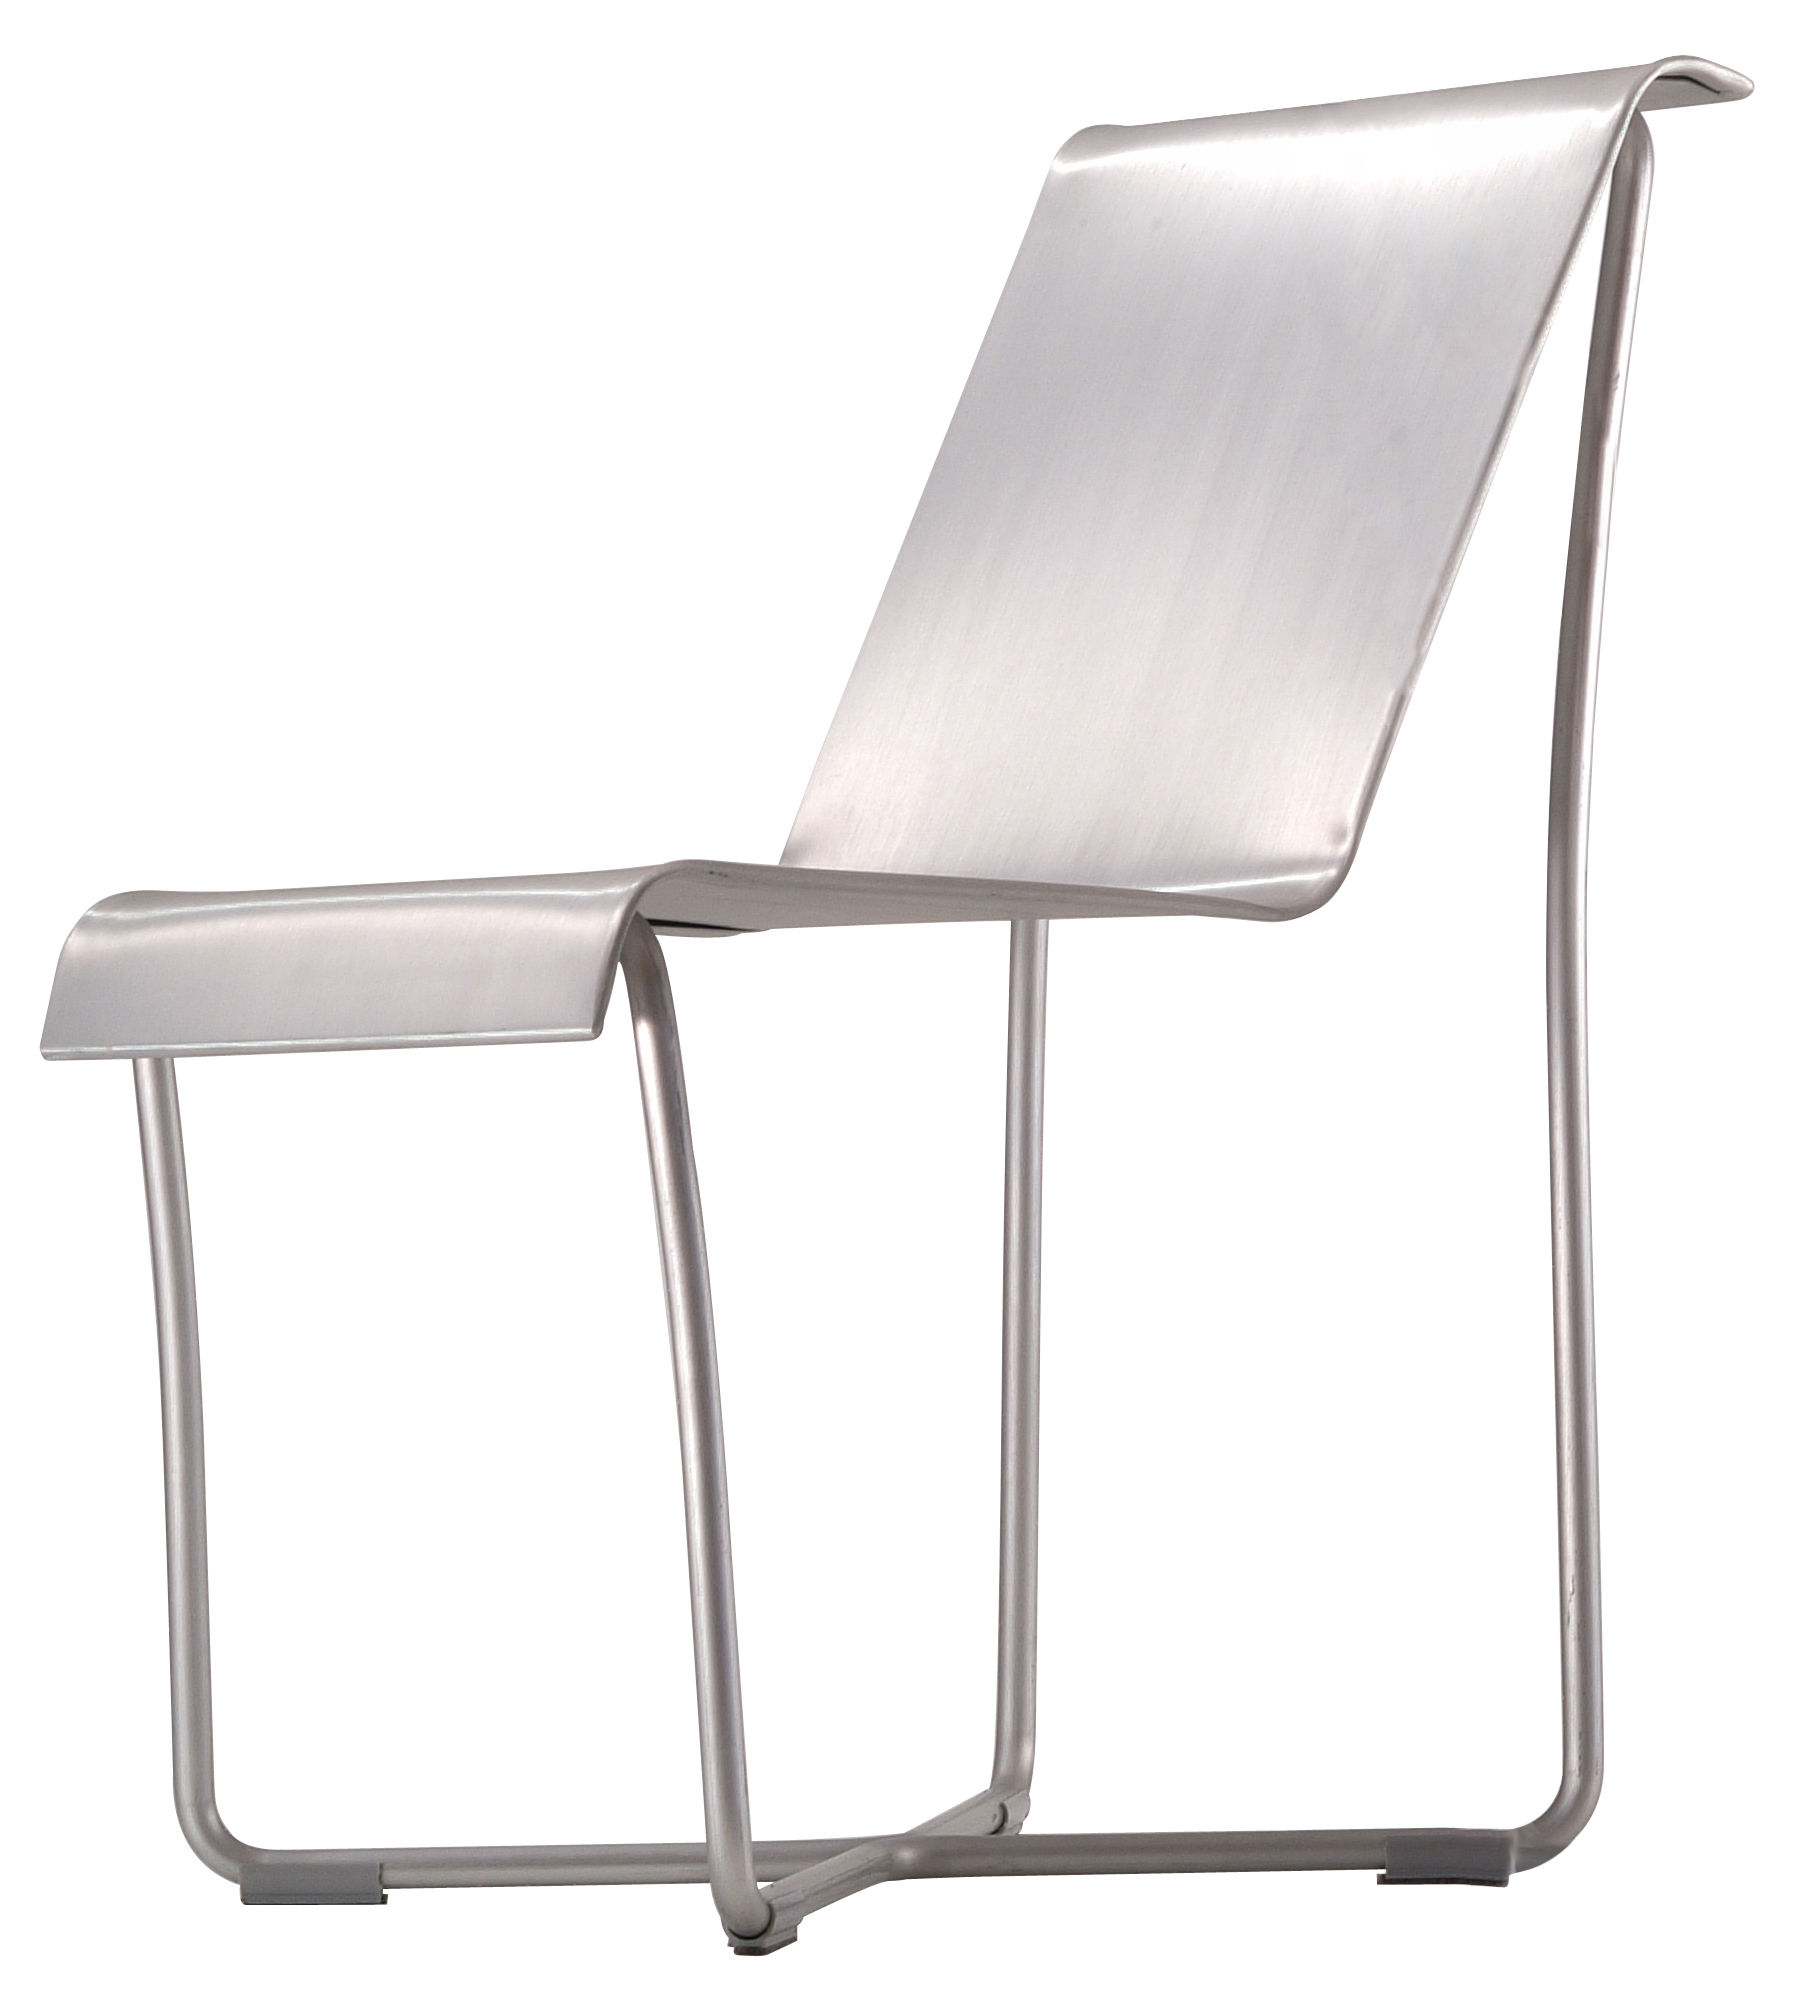 Mobilier - Chaises, fauteuils de salle à manger - Chaise Superlight Chair / Aluminium - Emeco - Aluminium mat - Aluminium recyclé